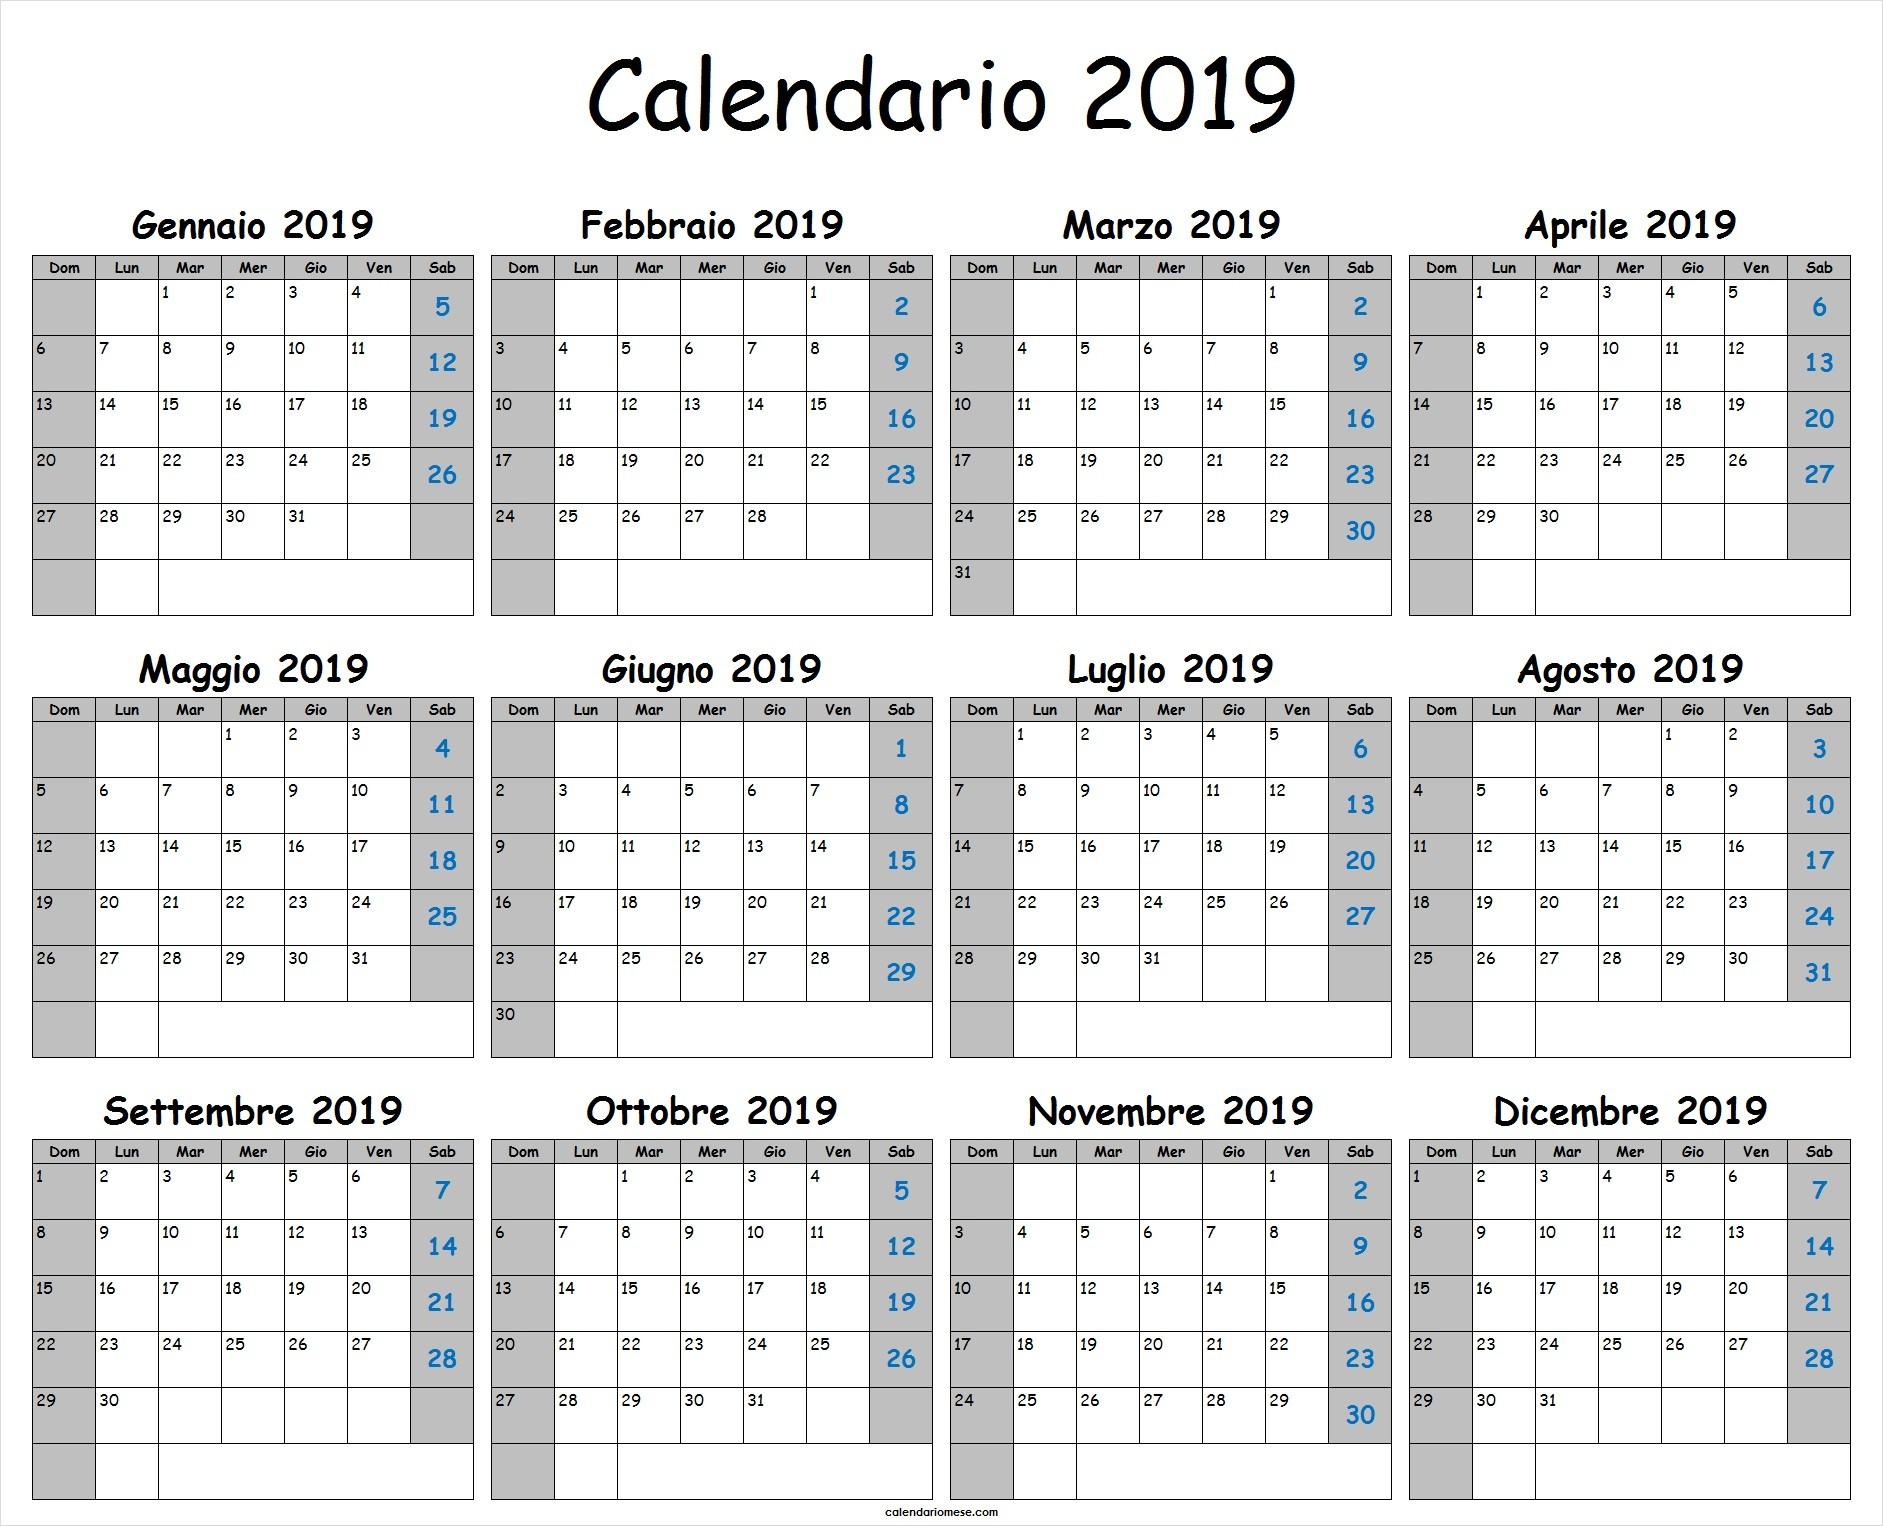 Calendario da stampare calendario da stampare calendario pdf 1883x1526 Turchese da stampare calendario 2019 pdf